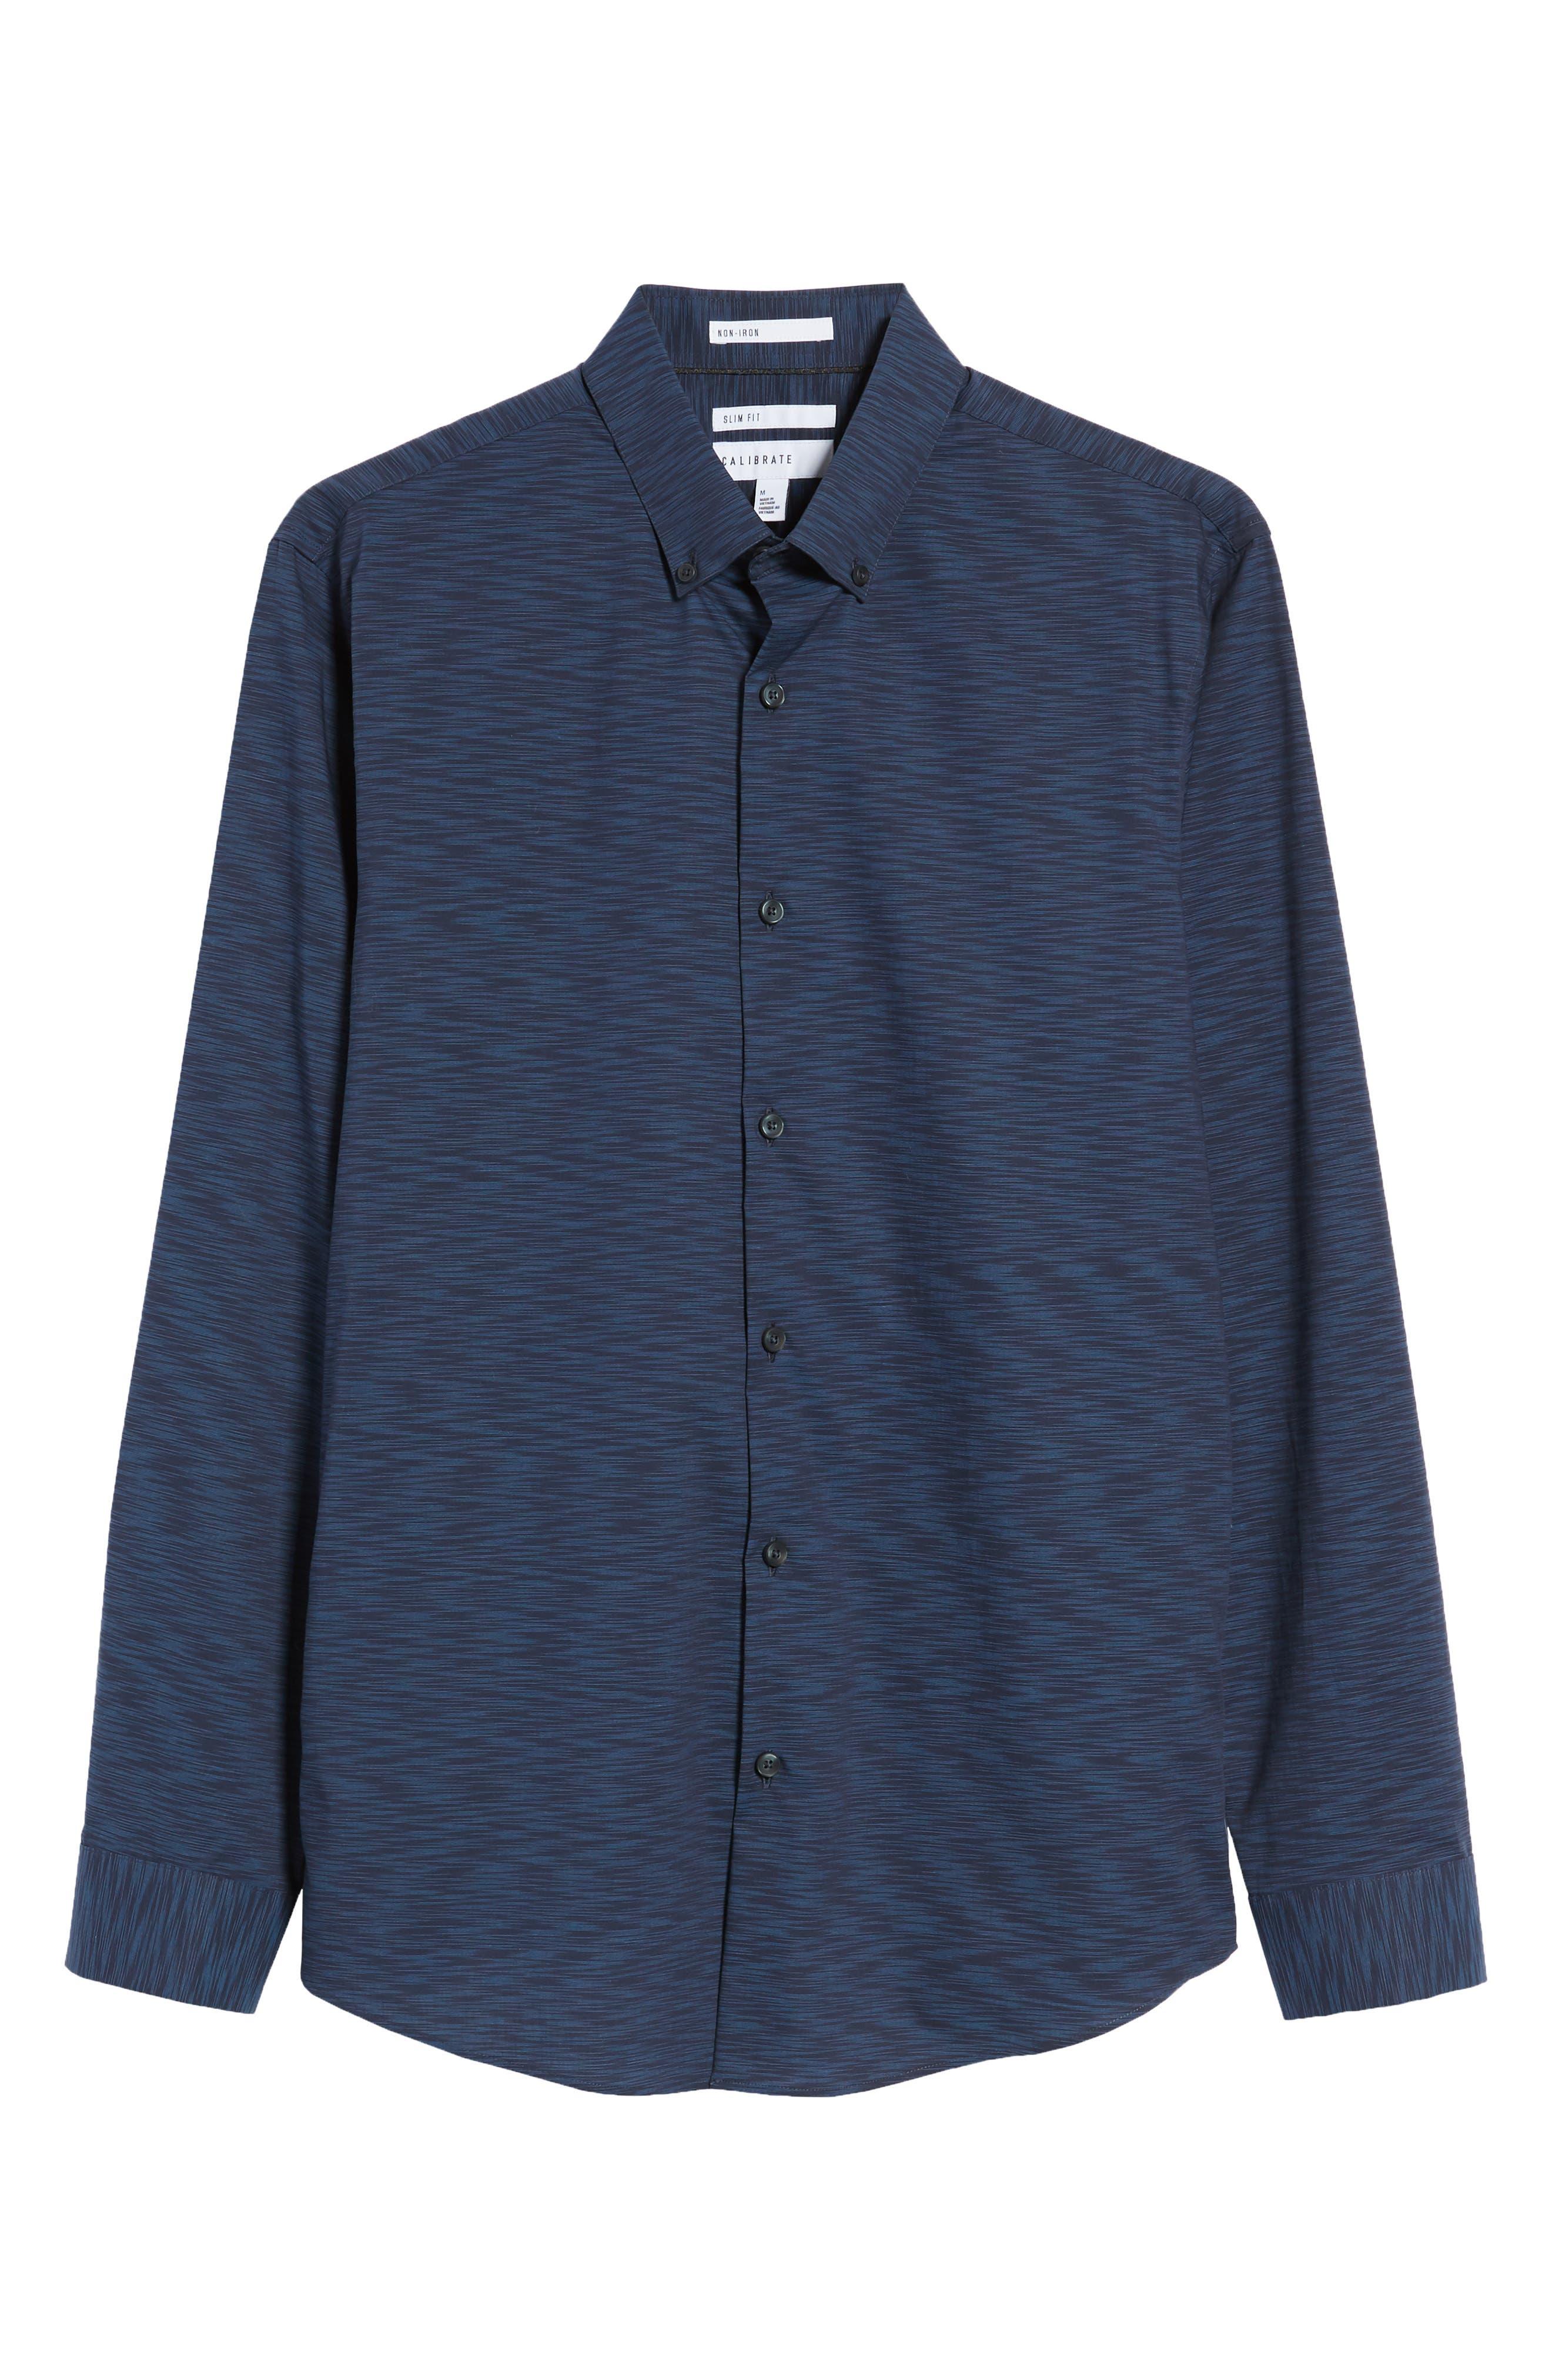 Trim Fit Solid Sport Shirt,                             Alternate thumbnail 6, color,                             Navy Blue Space Dye